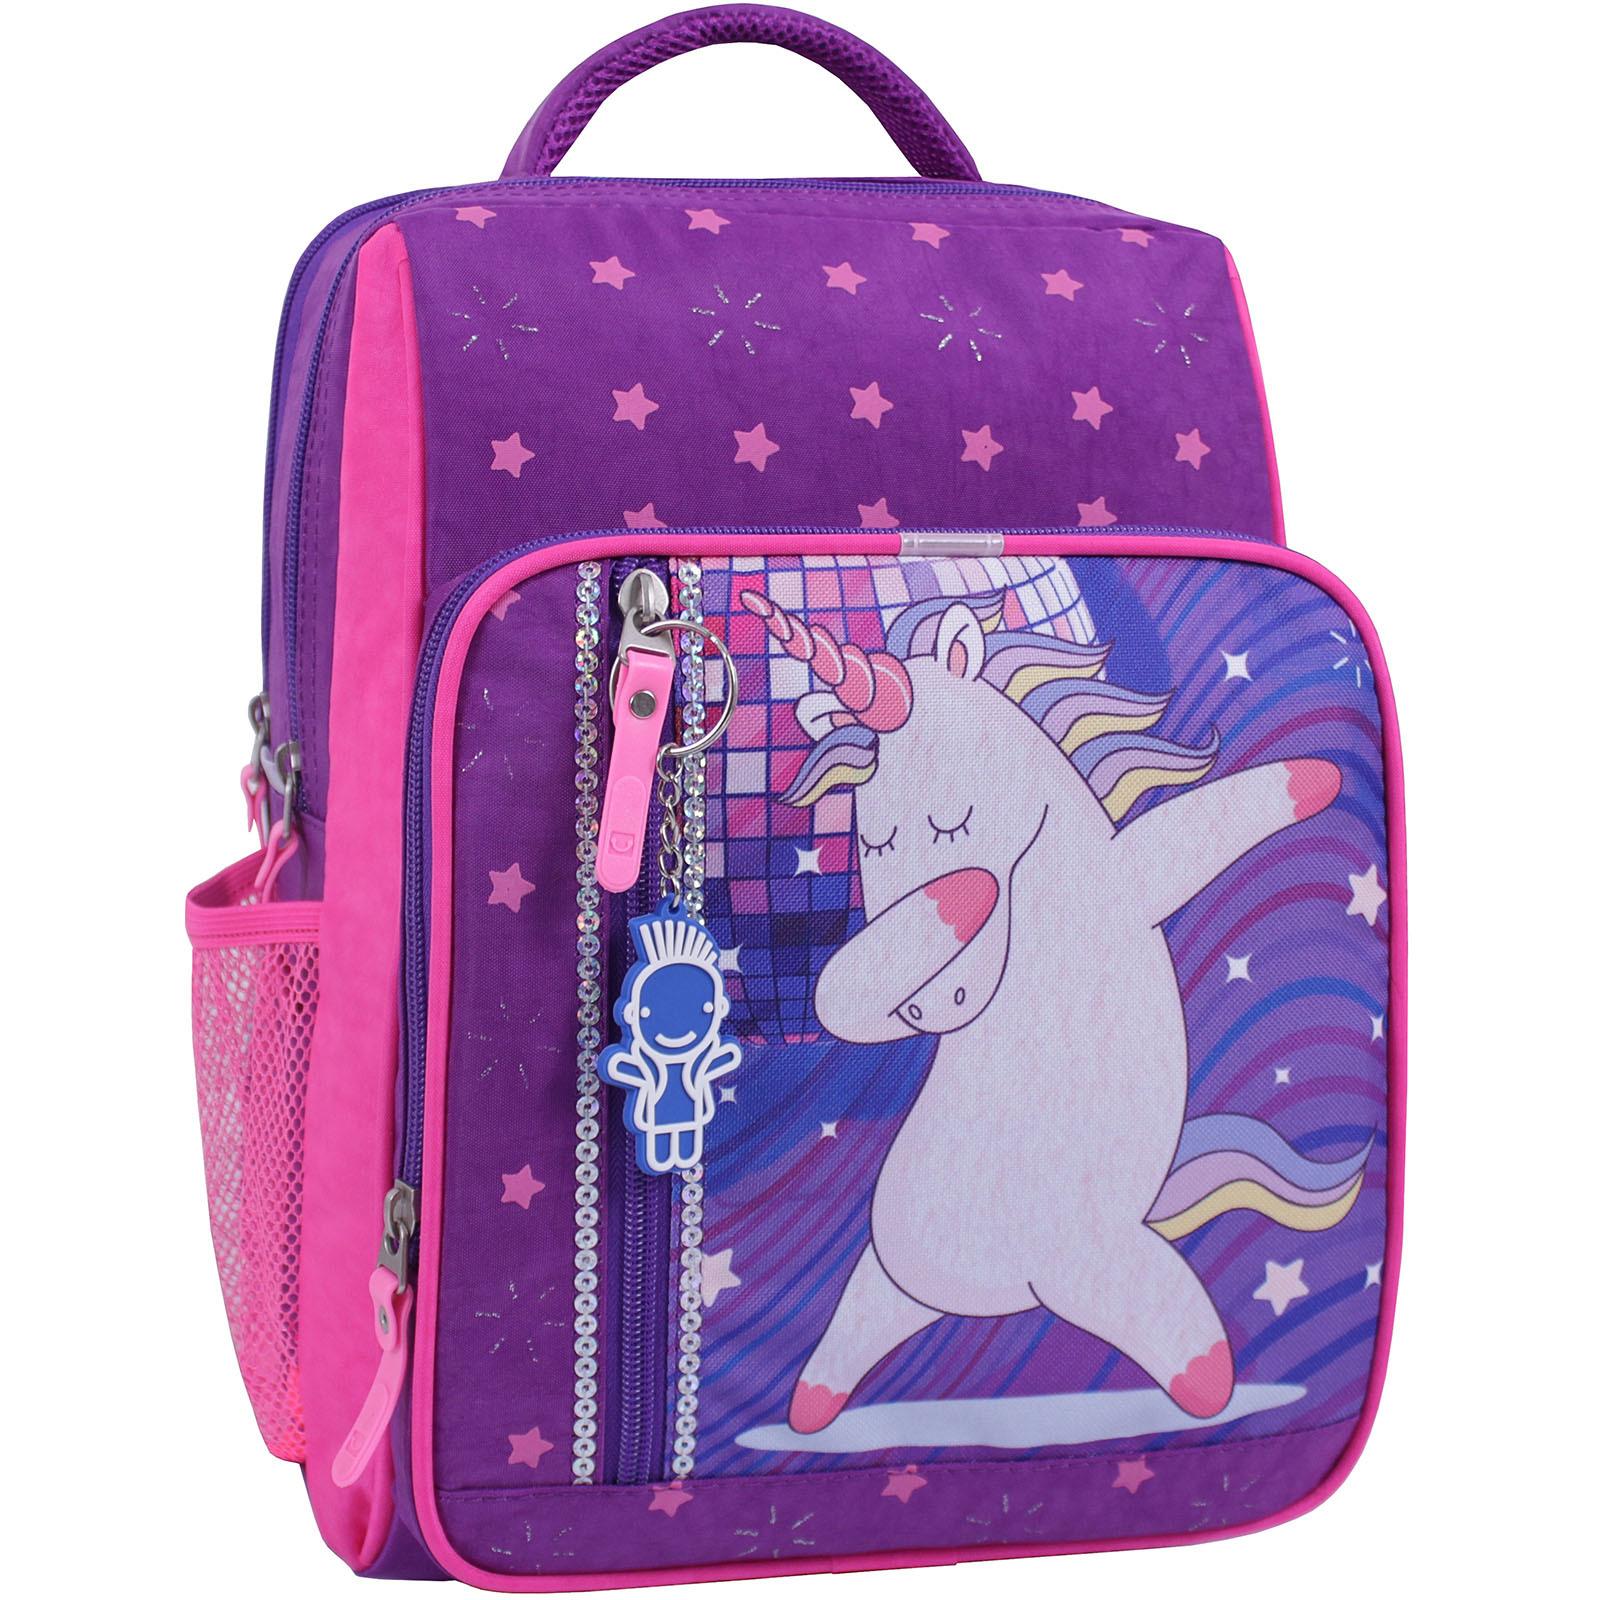 Школьные рюкзаки Рюкзак школьный Bagland Школьник 8 л. Фиолетовый 503 (00112702) IMG_1587_суб.503_.JPG